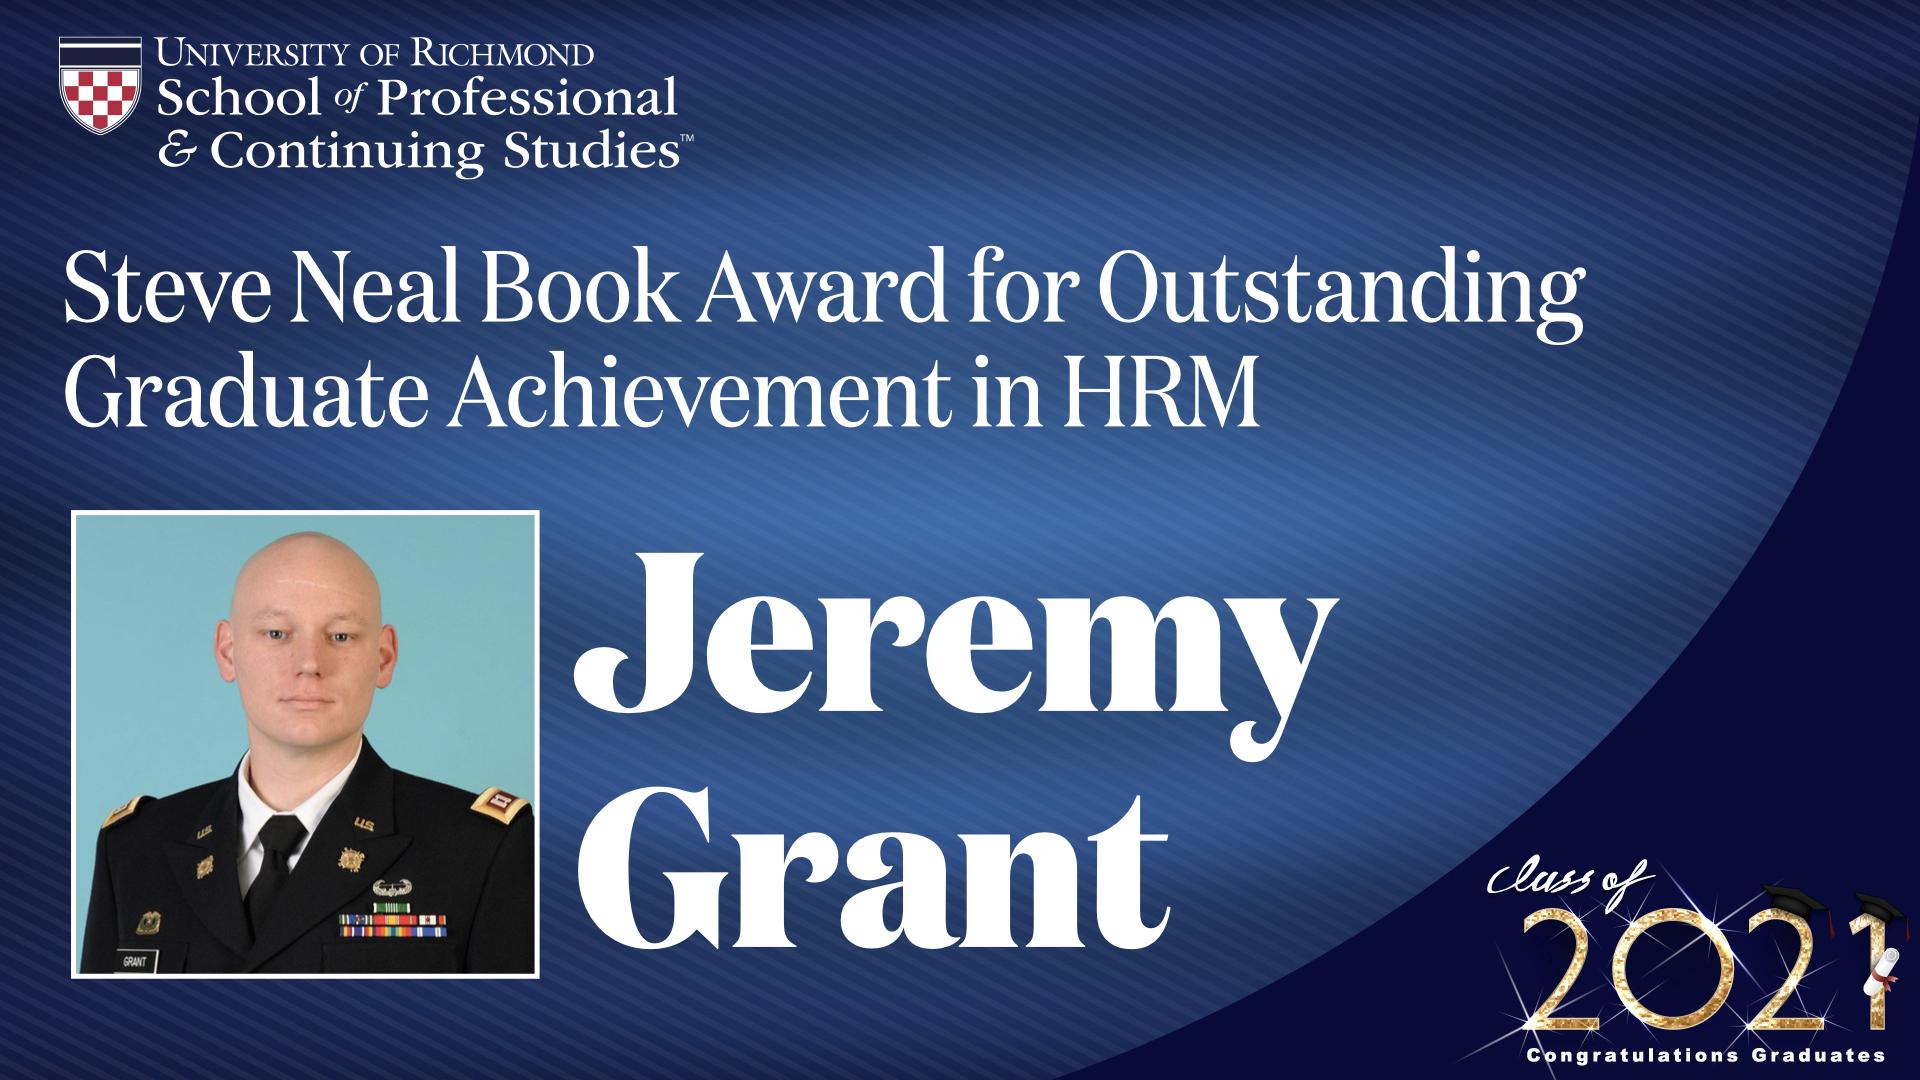 Graduate book award headshot and award name